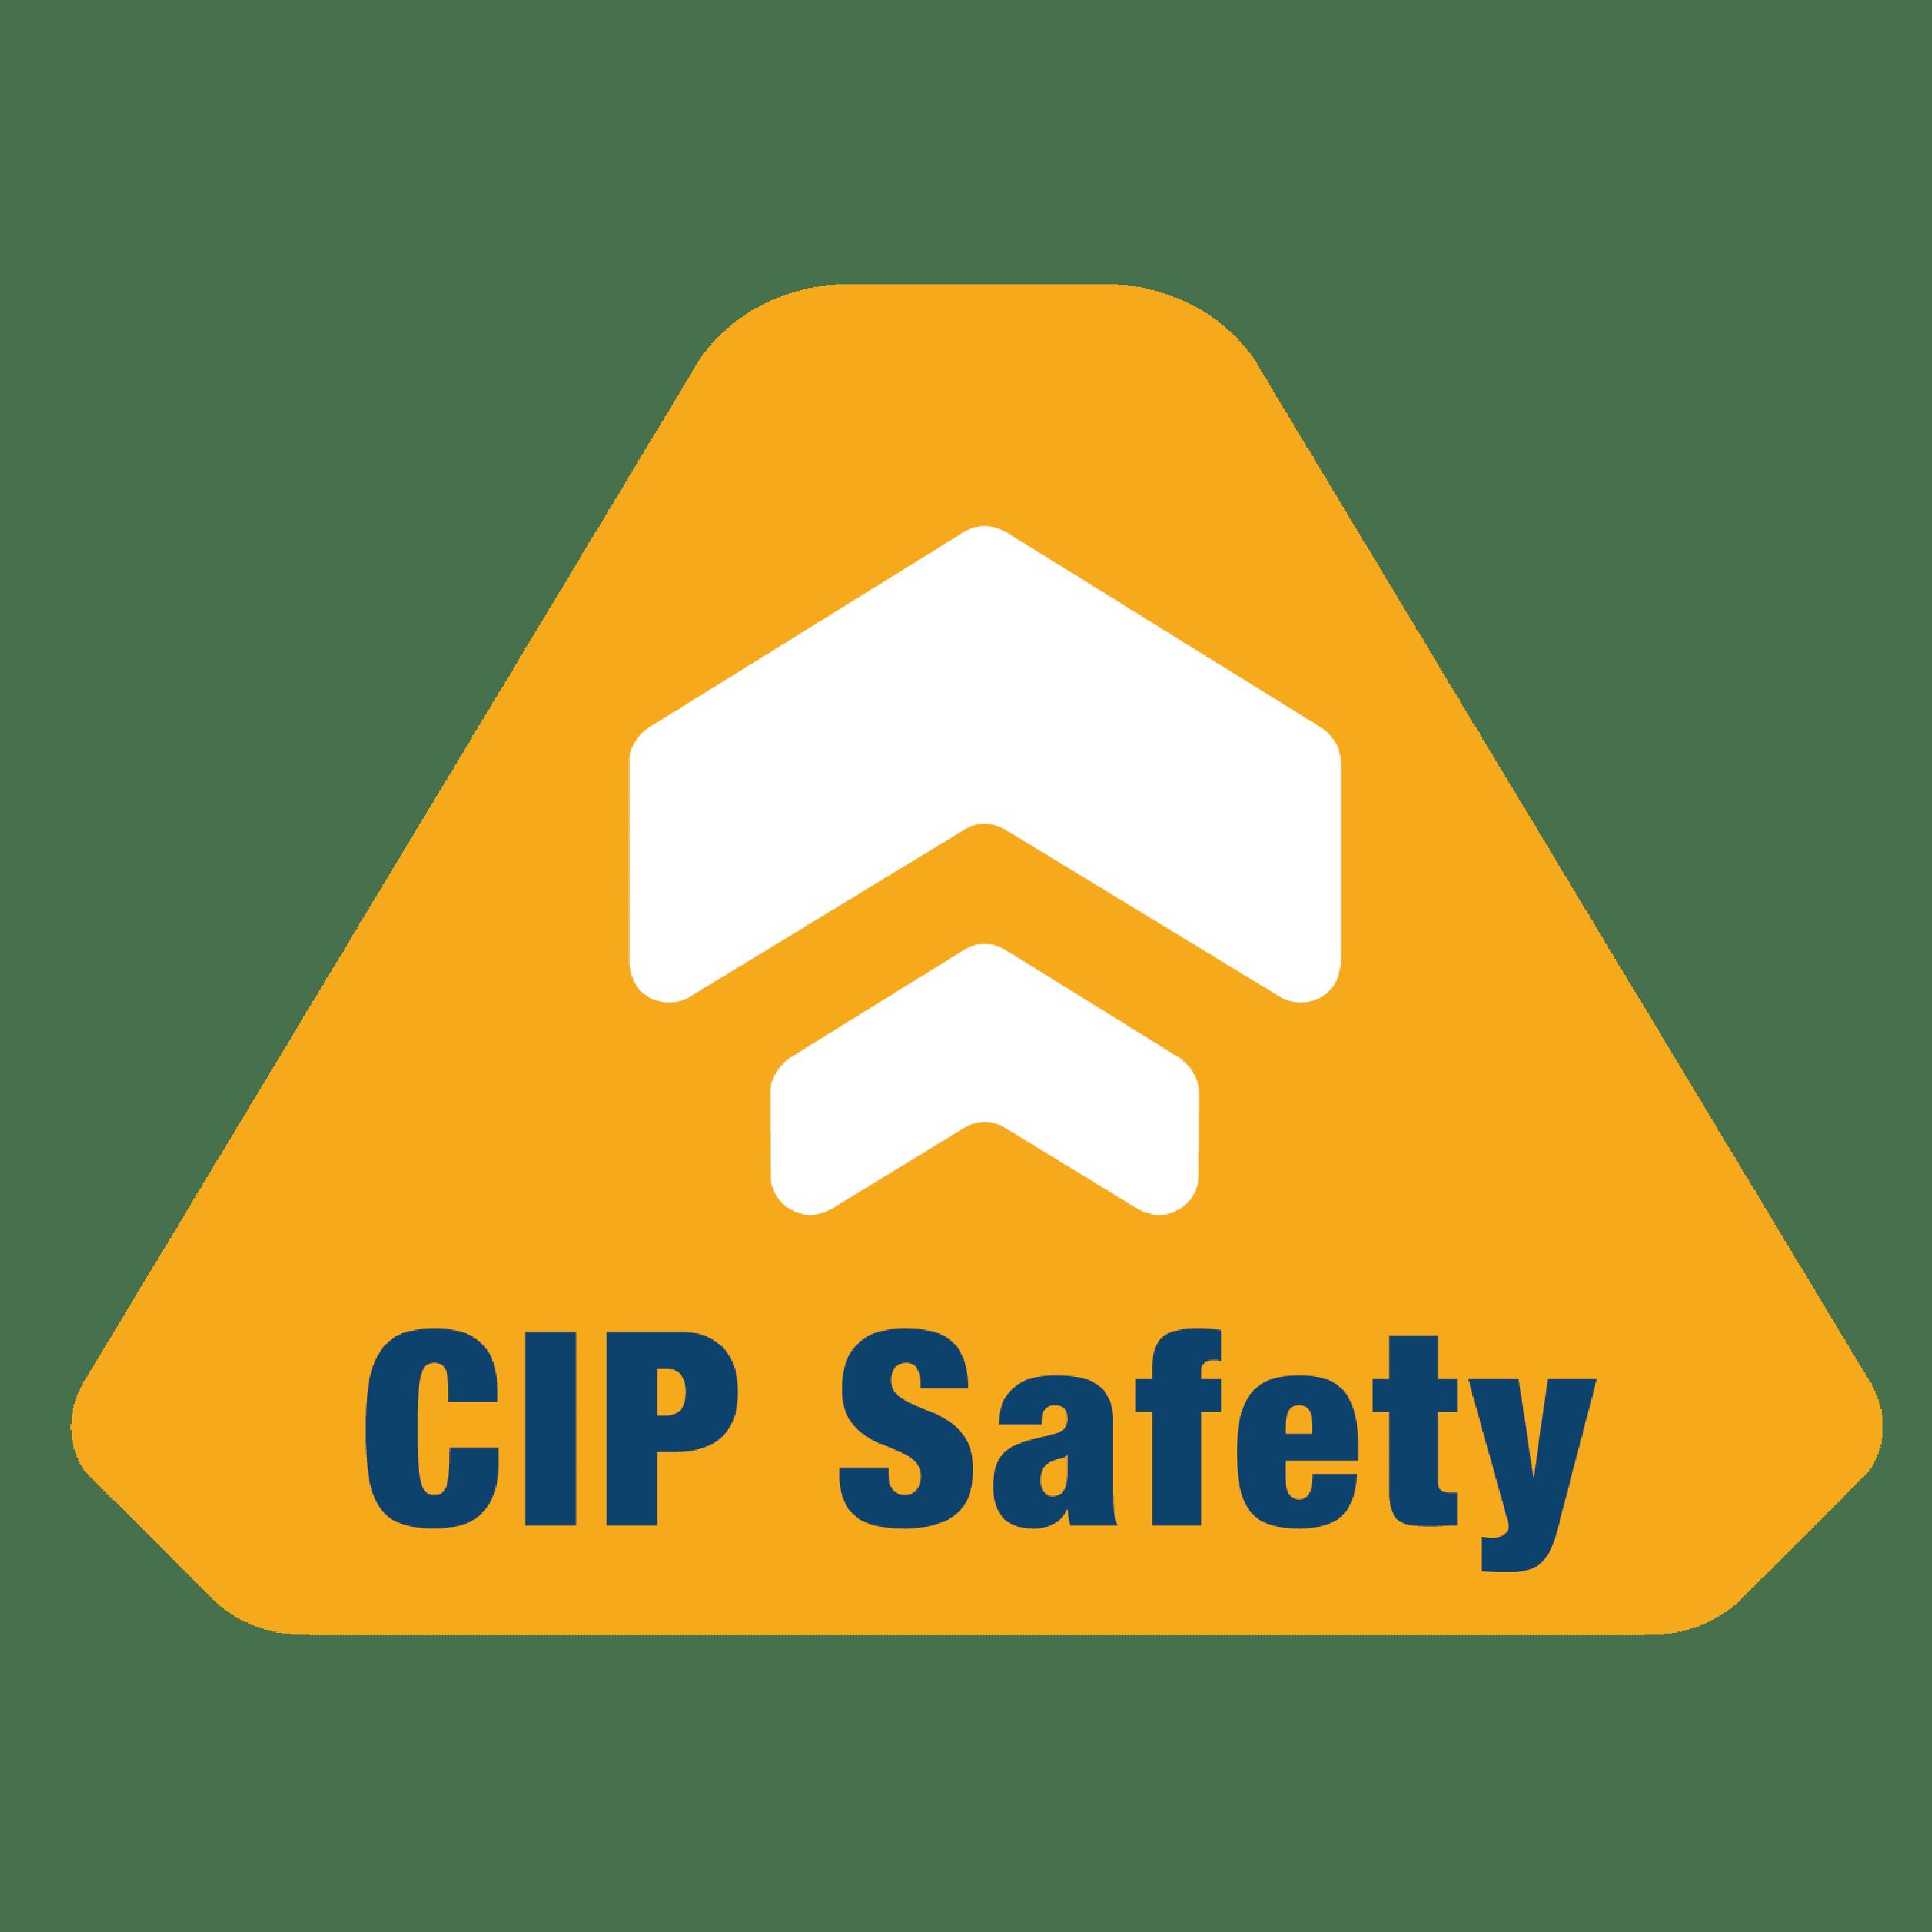 CIP Safety